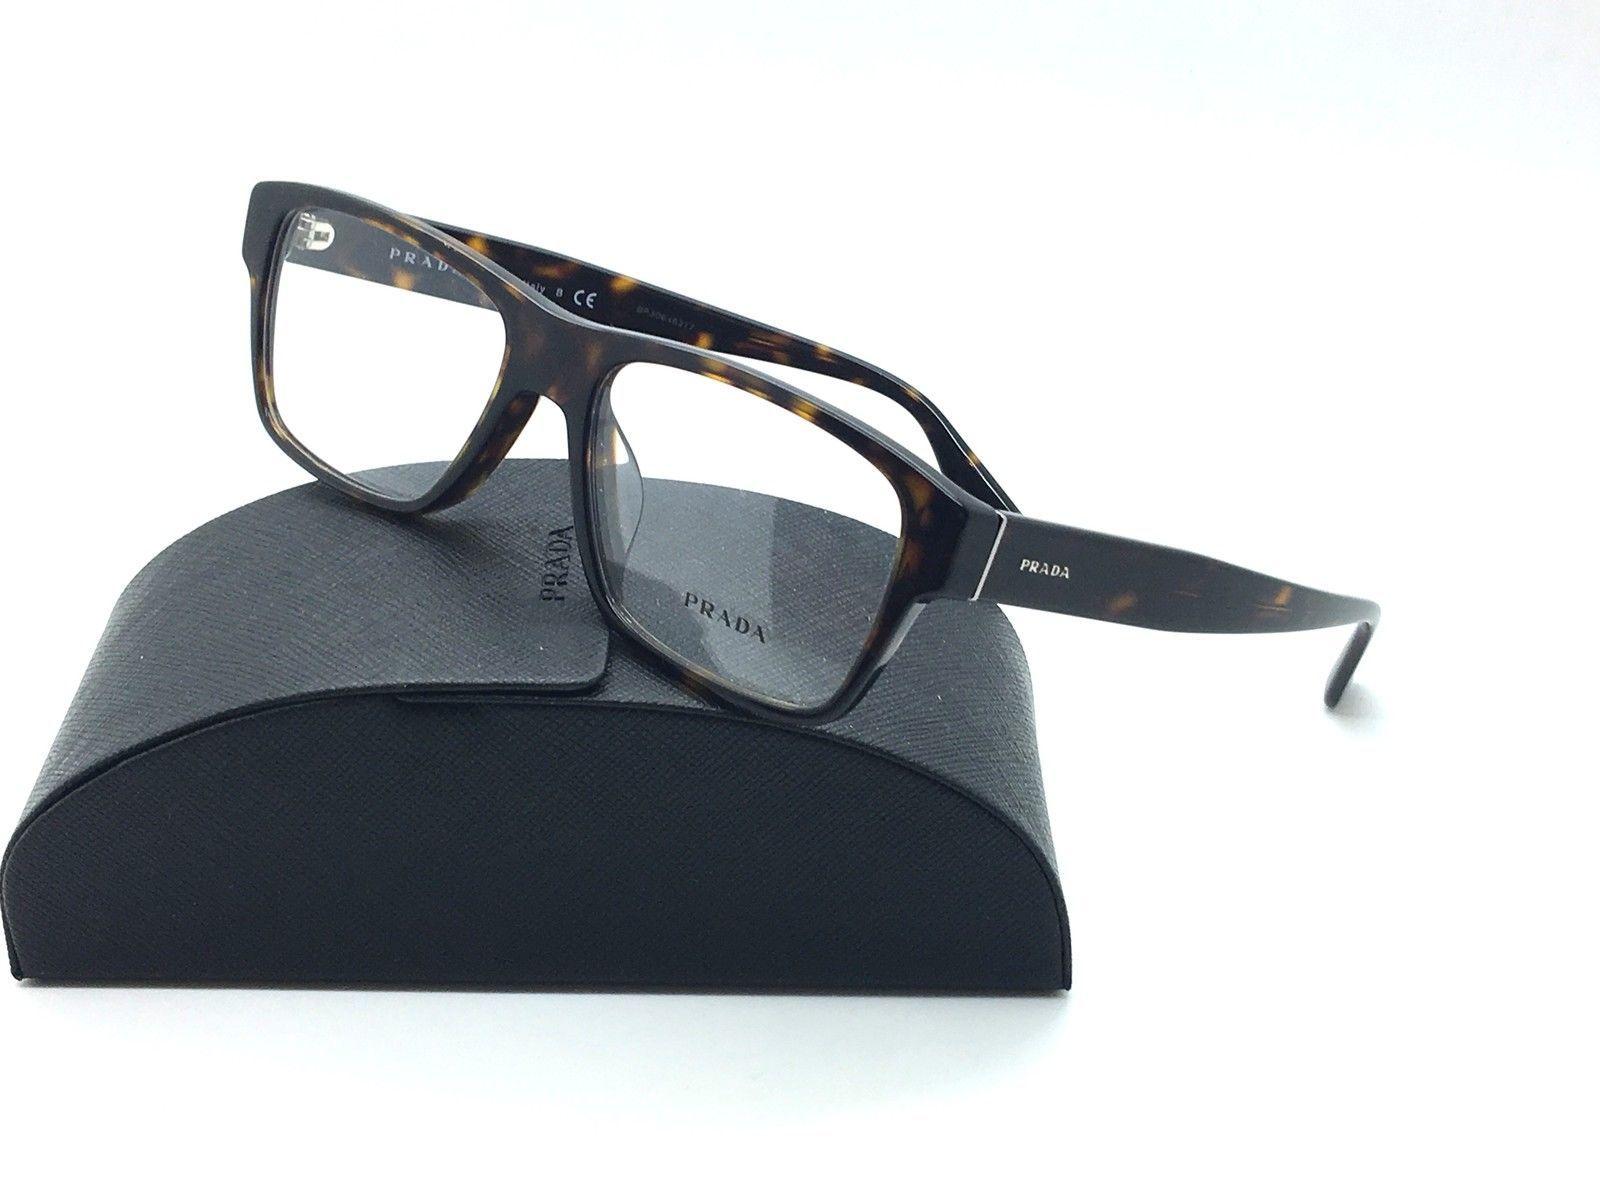 75e758fed481 S l1600. S l1600. Prada Havana Eyeglasses VPR 17S F 2AU 1O1 55 mm Designer  Demo Lenses. Free Shipping